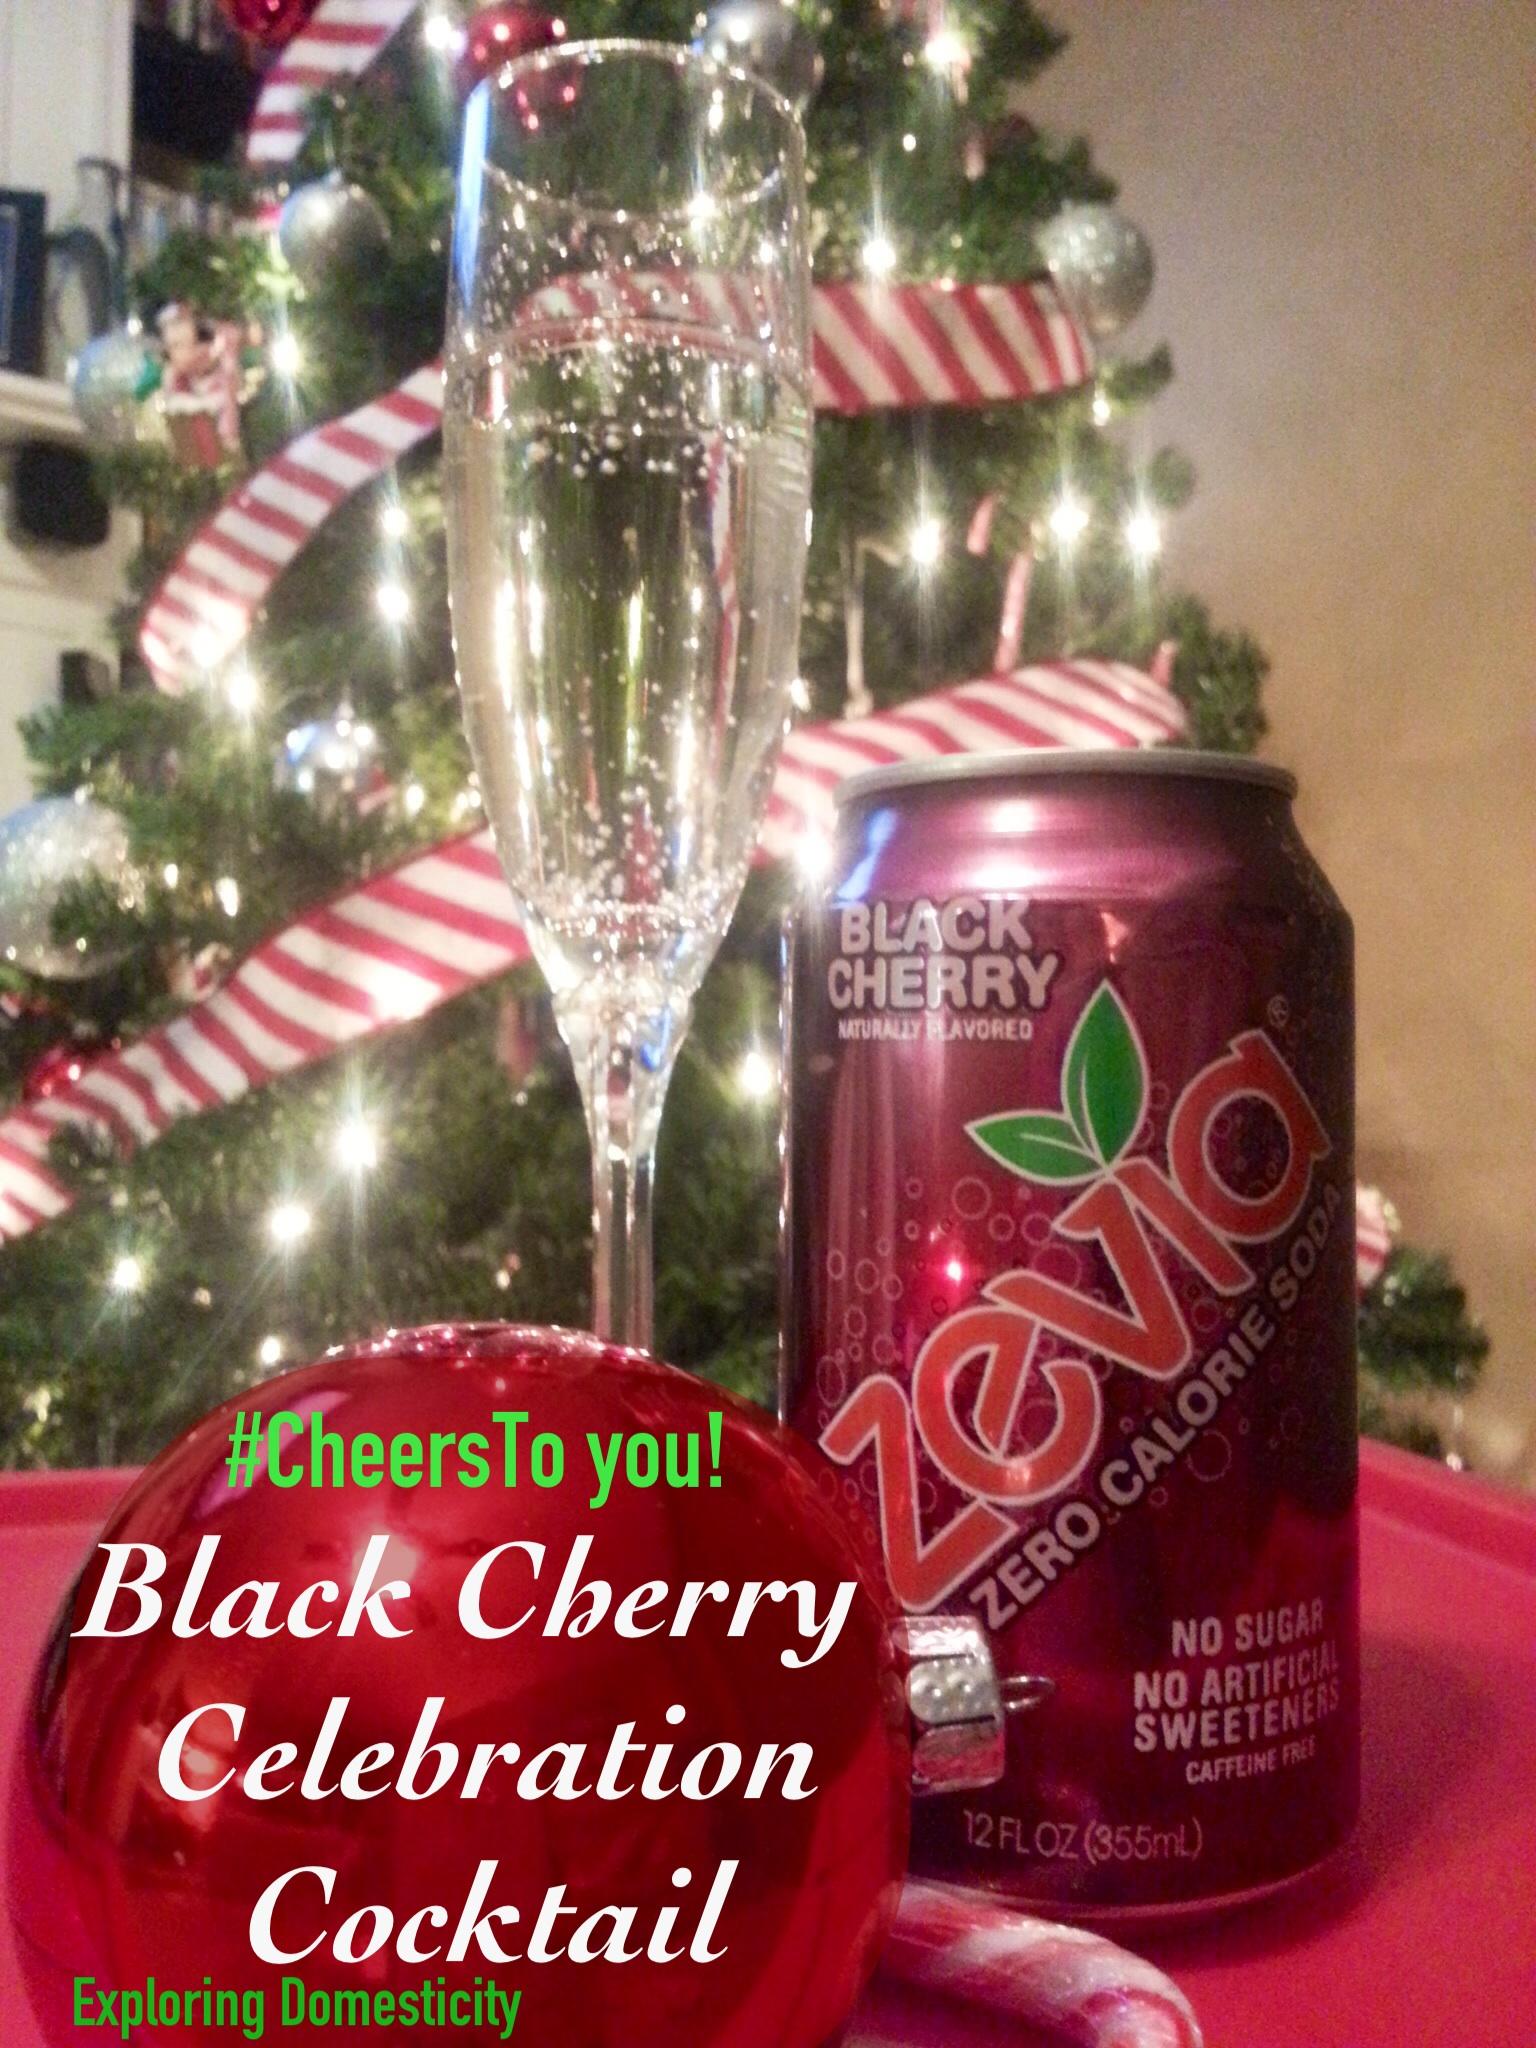 Black Cherry Celebration Cocktail with Zevia